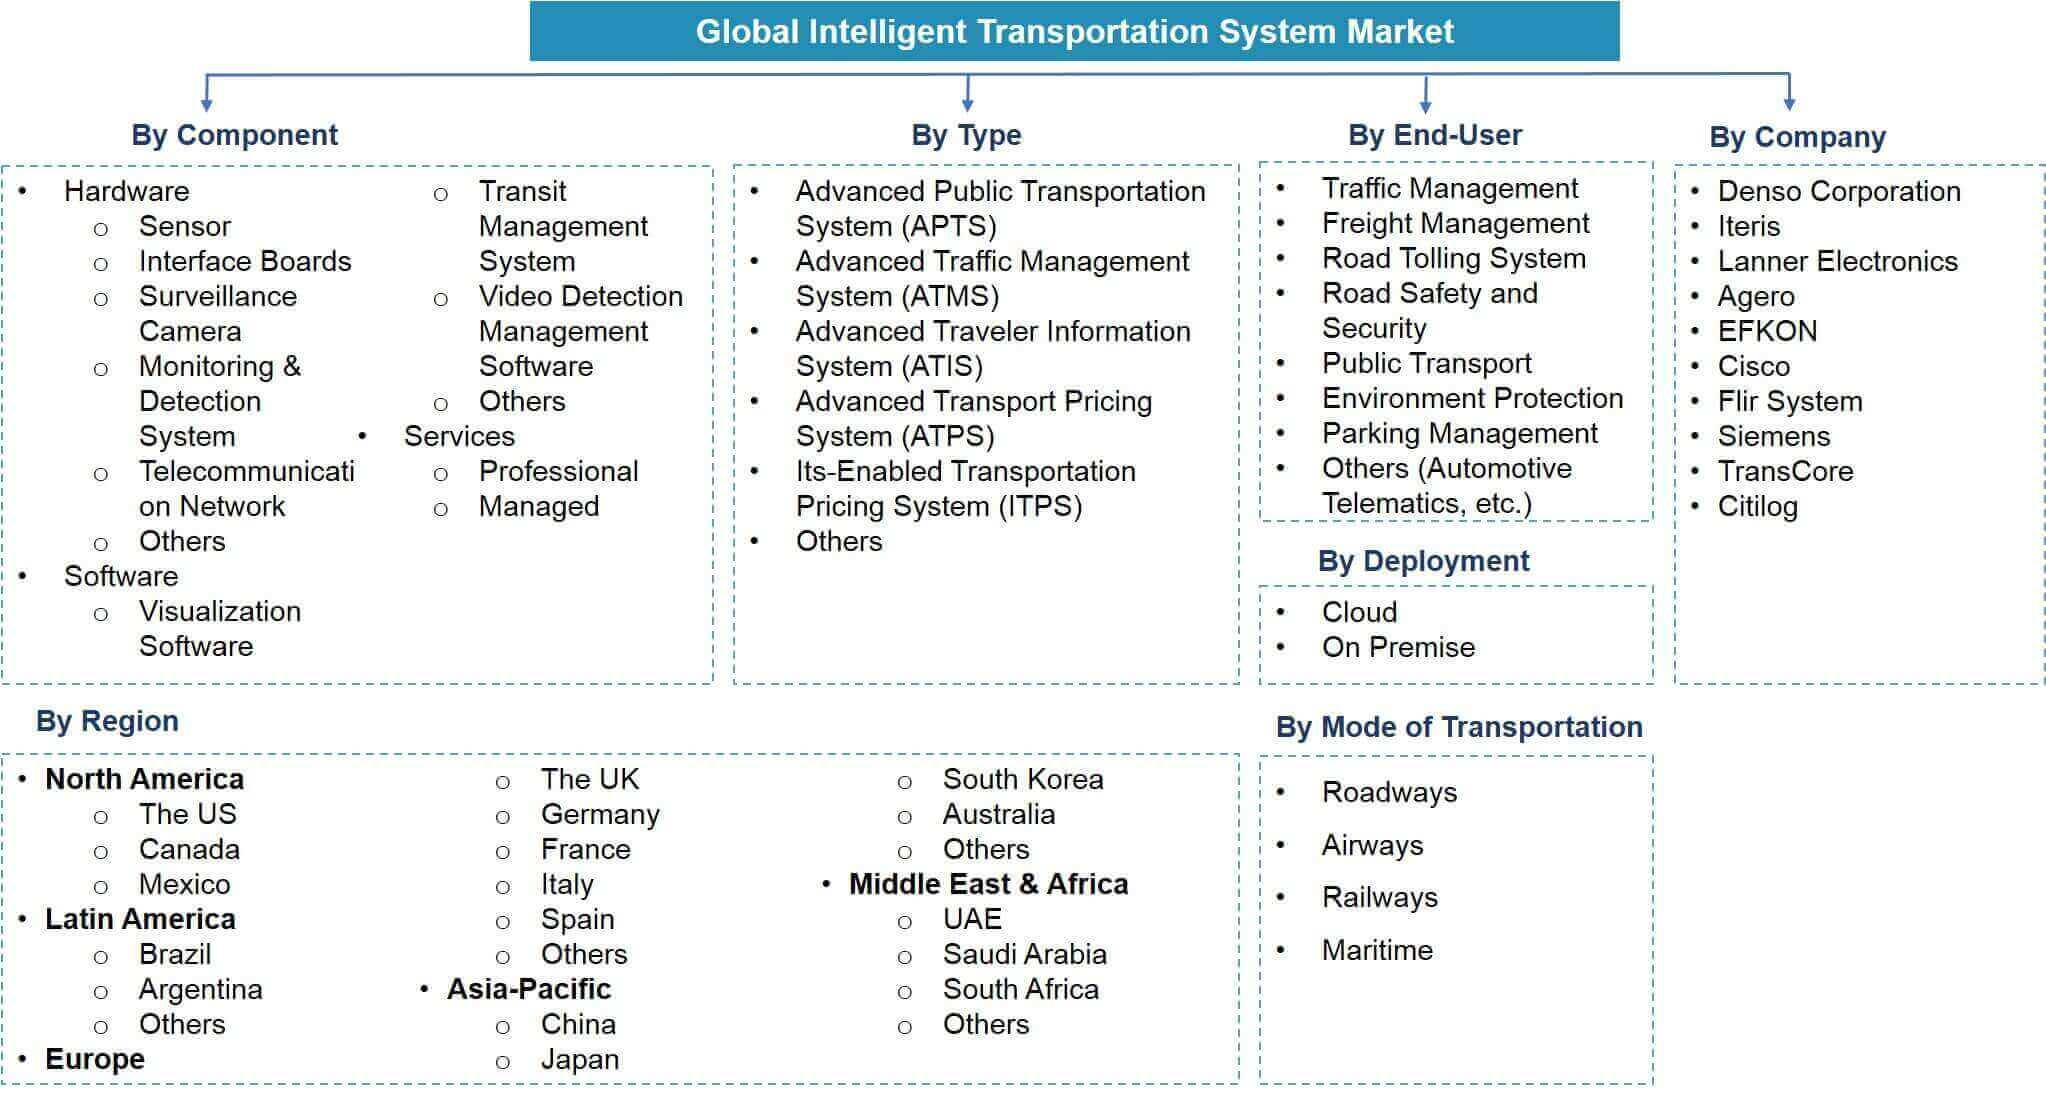 Global Intelligent Transportation System Market Segmentation